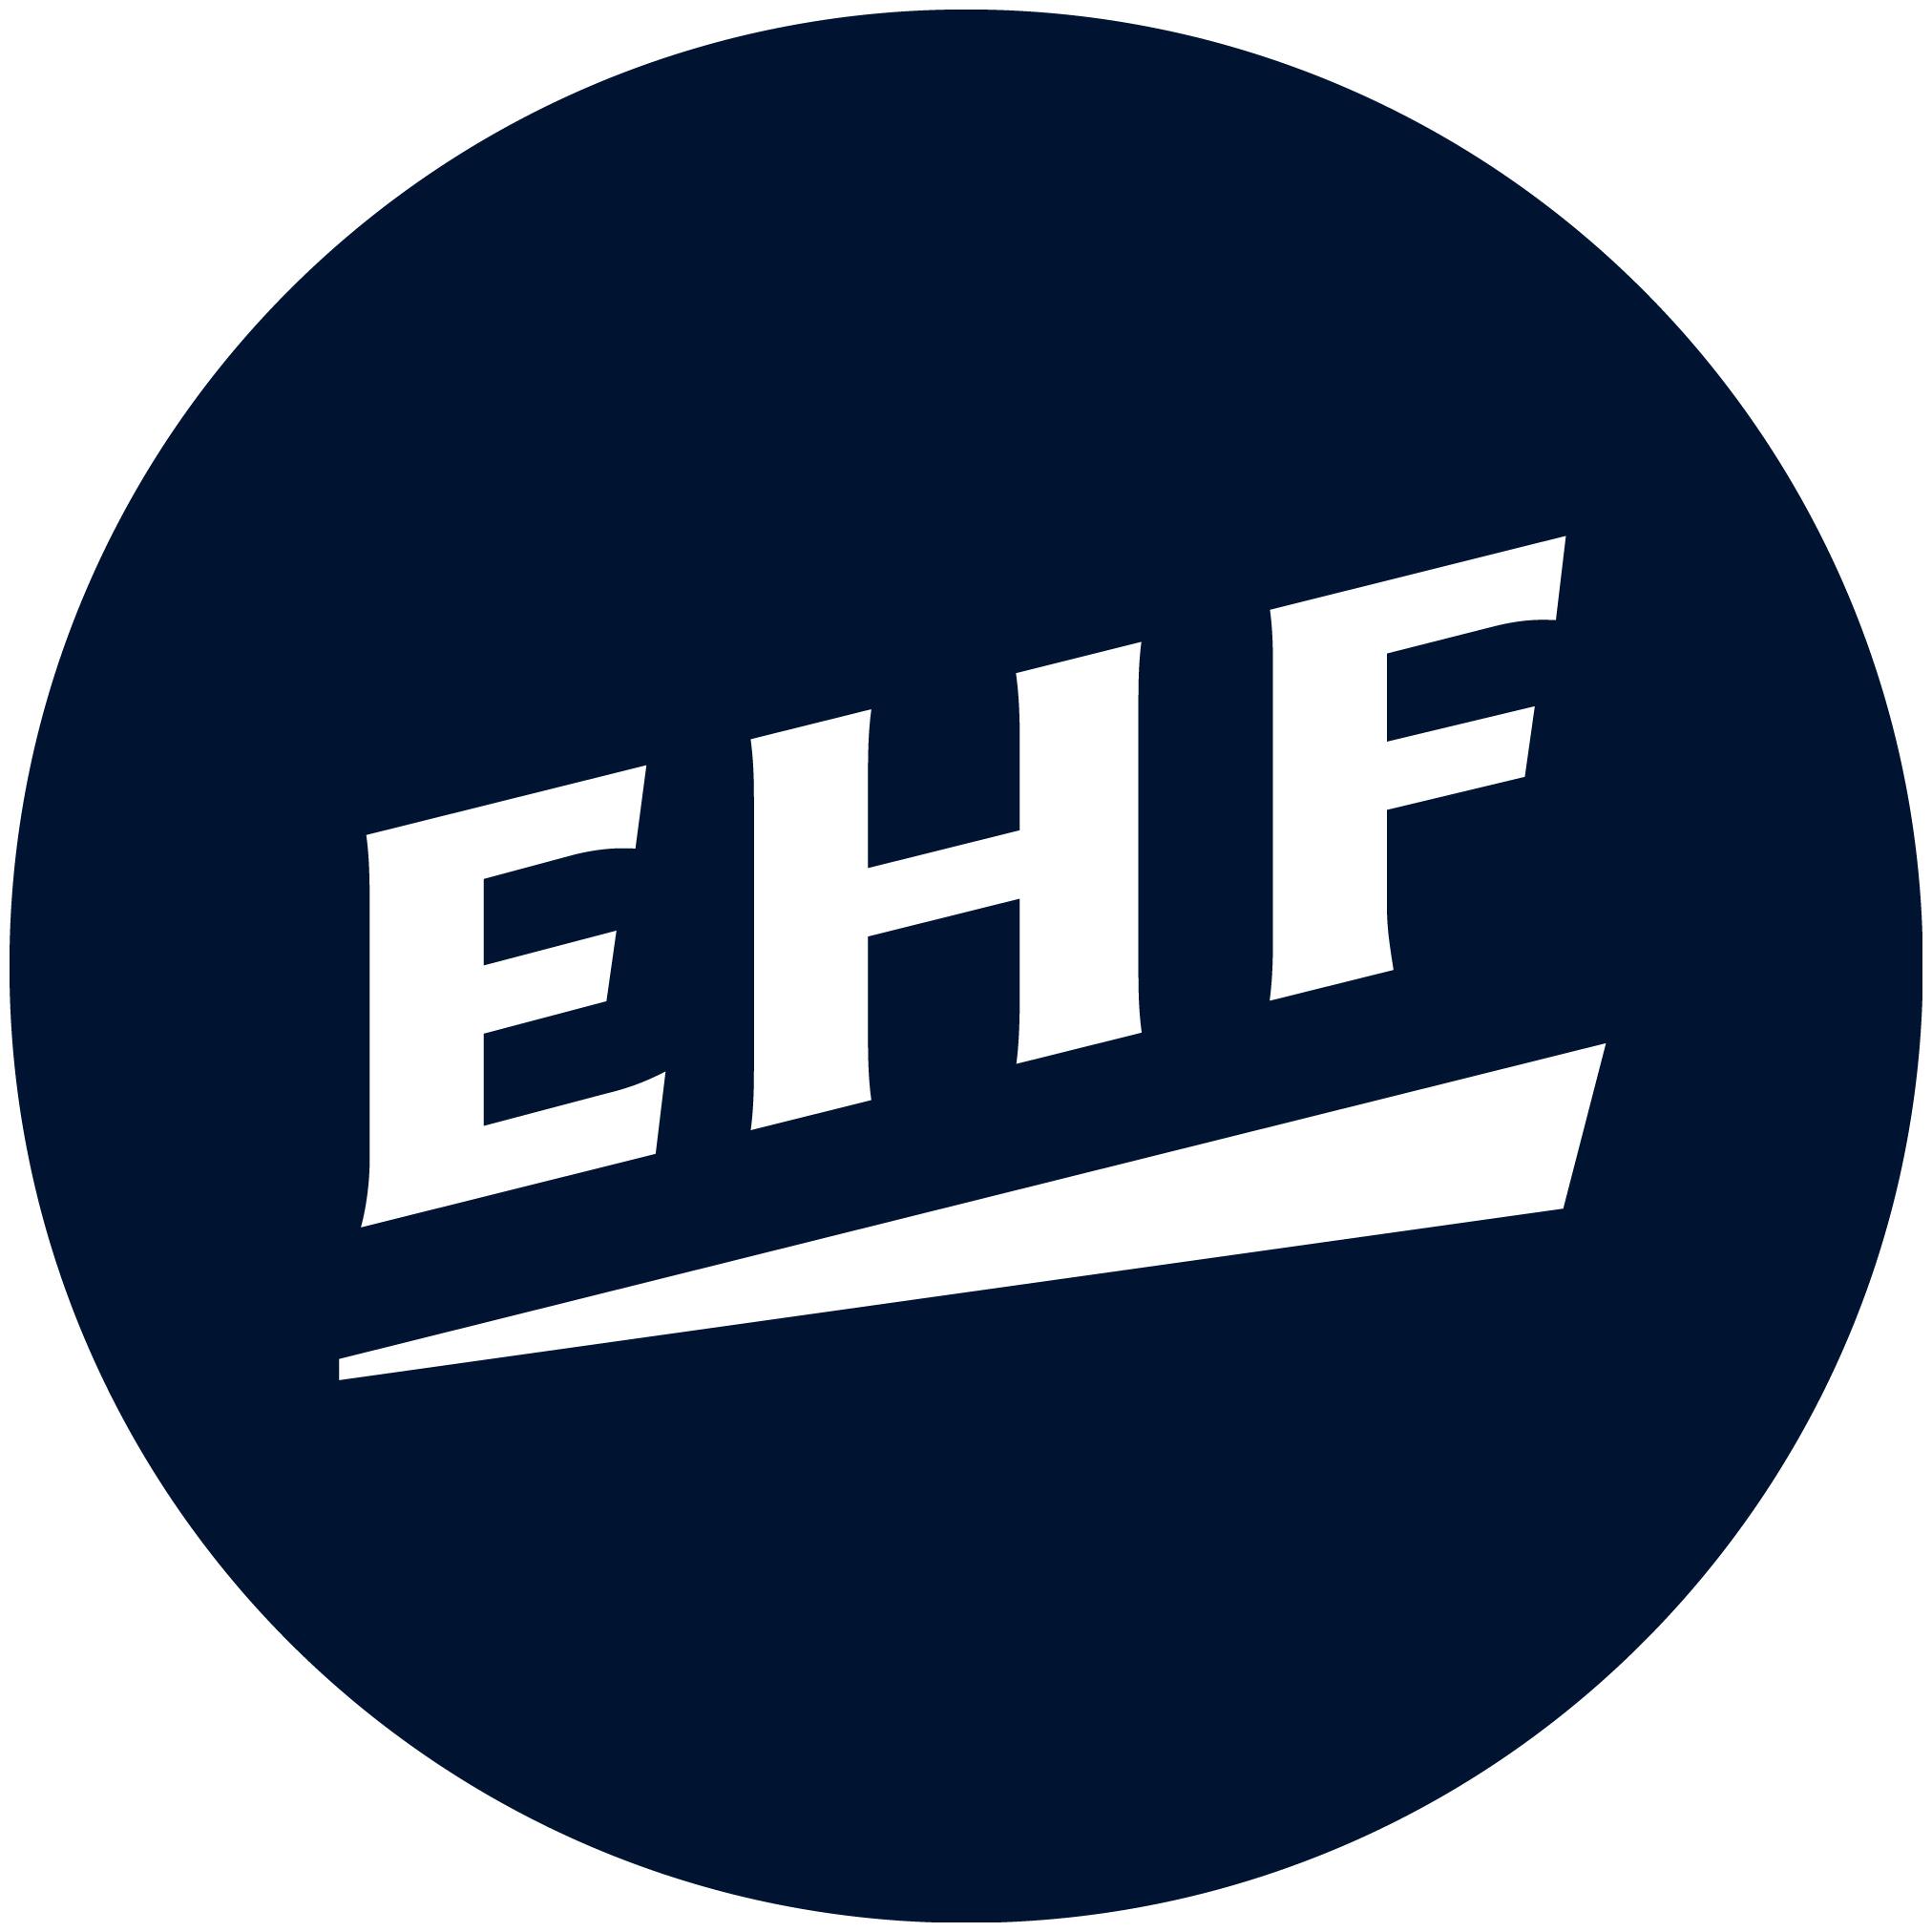 2019 European Women's 17 Handball Championship - GEO